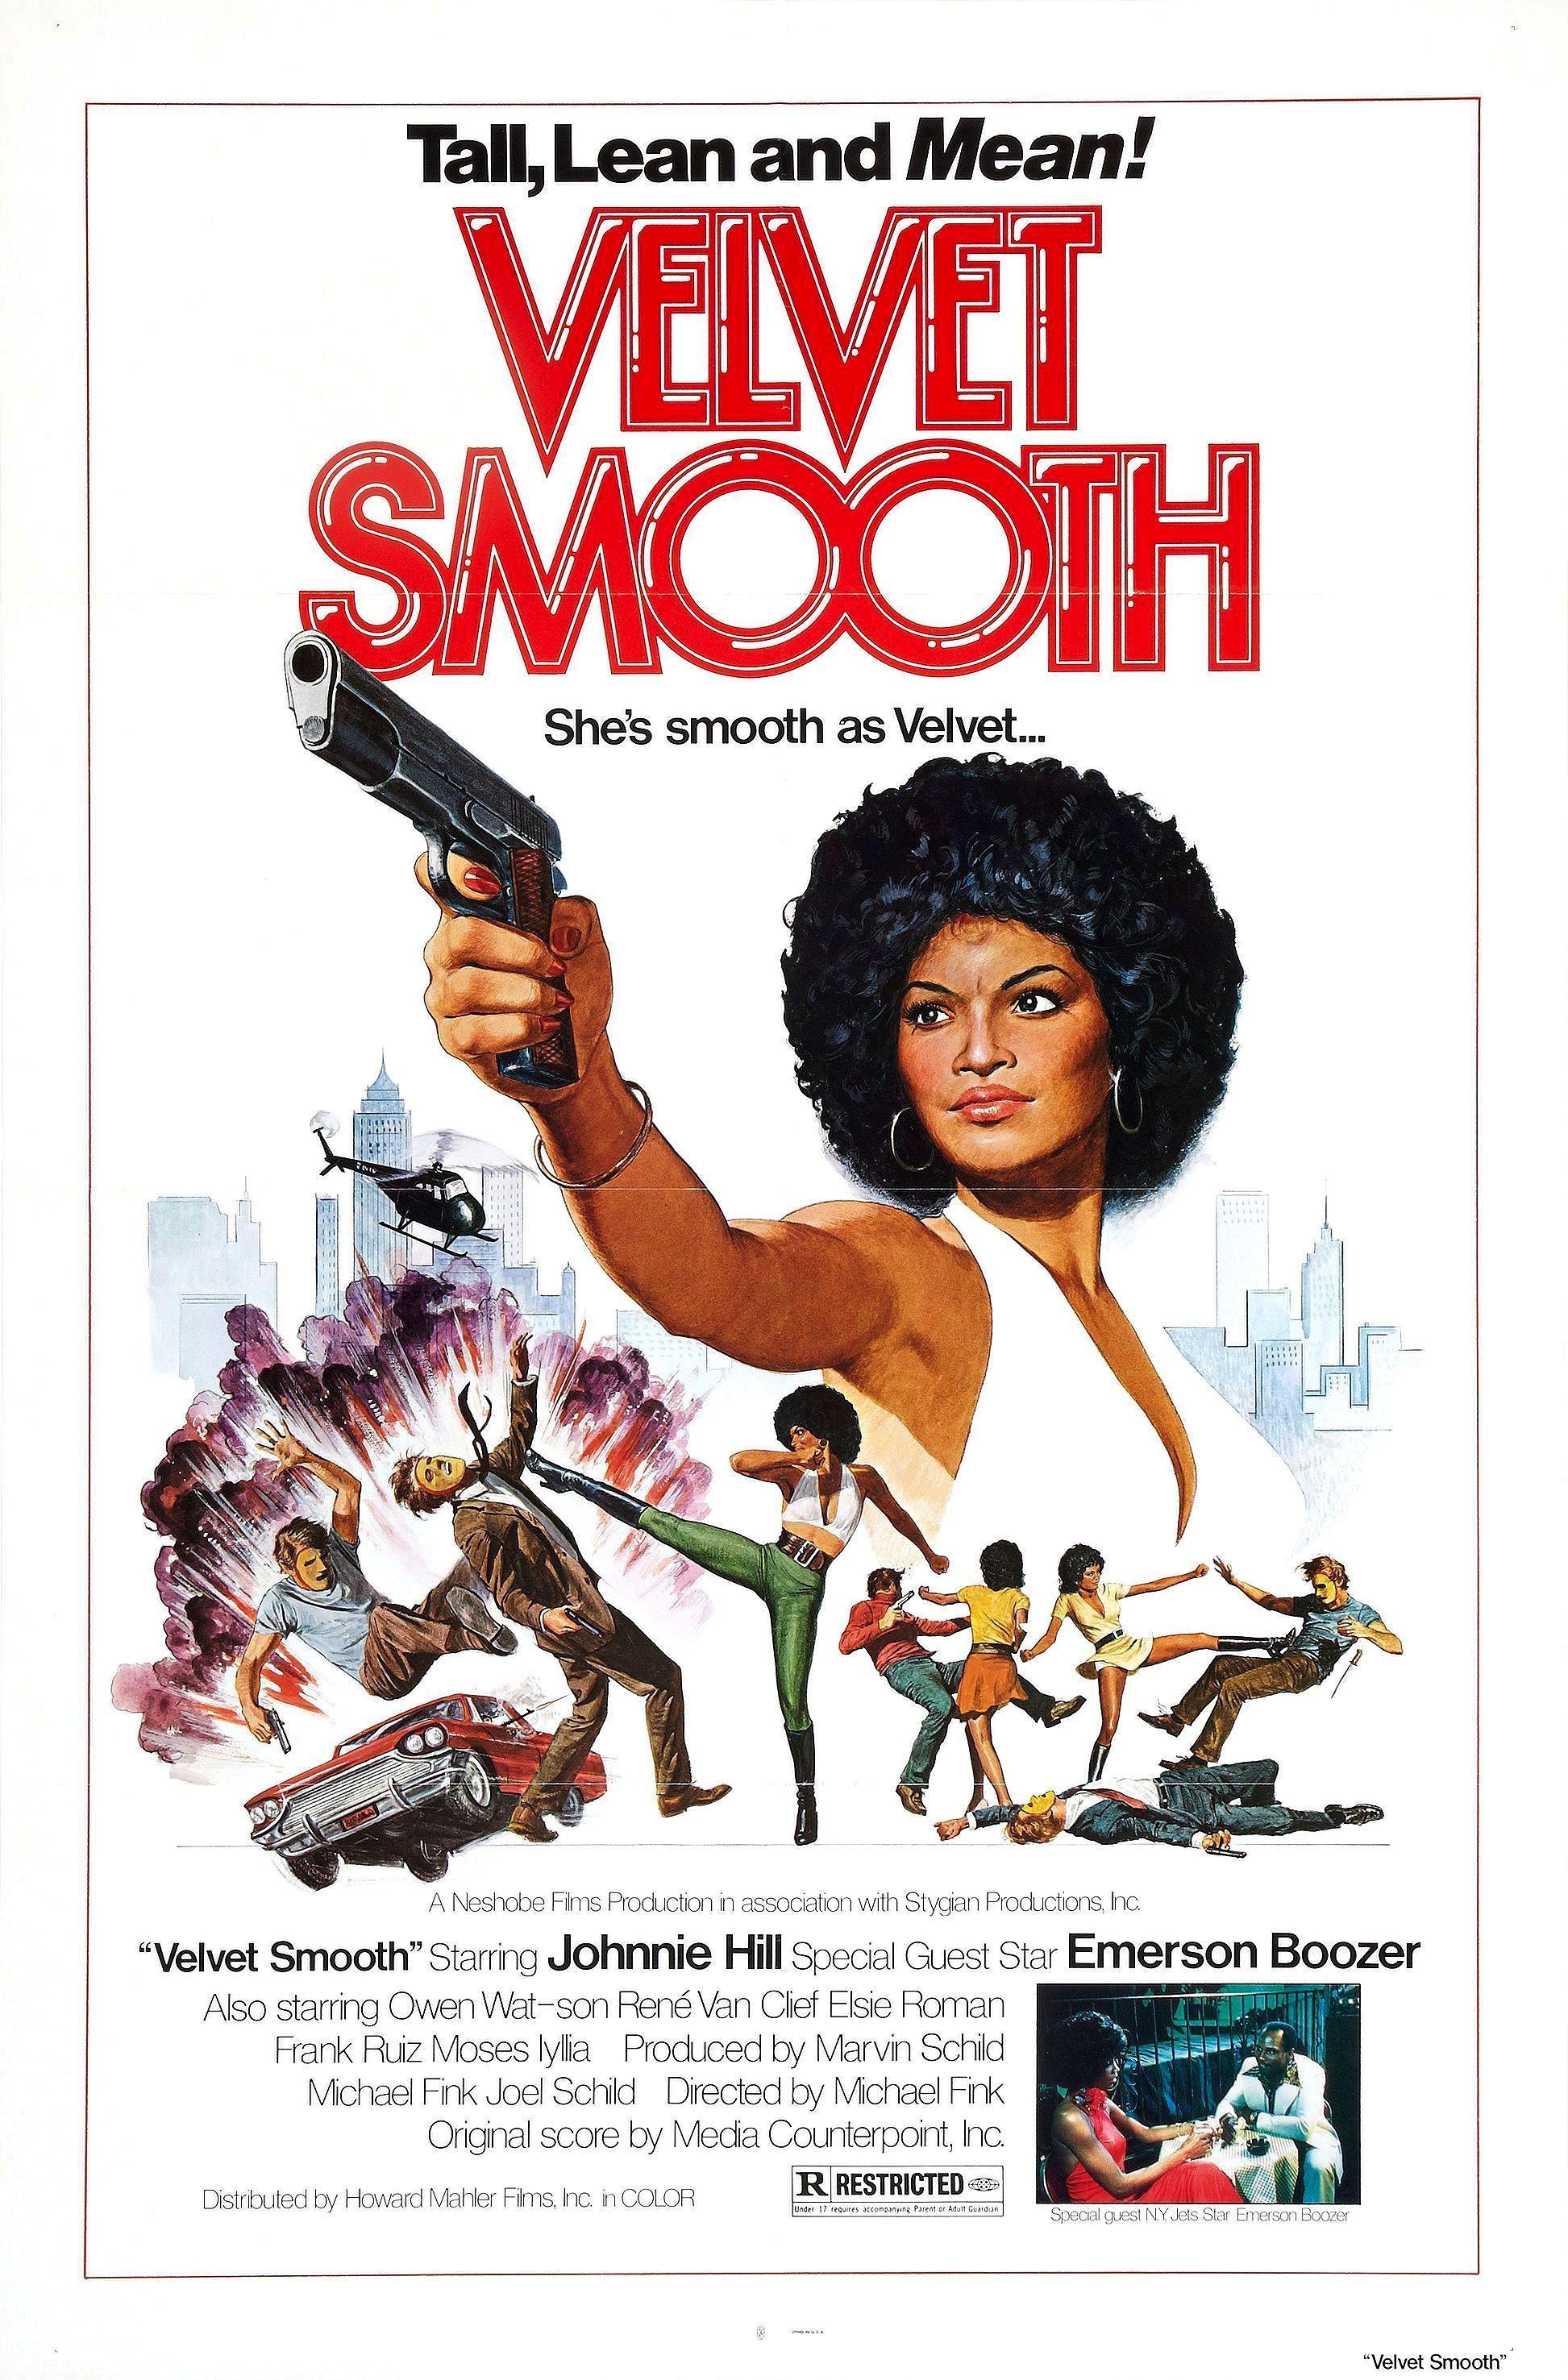 Velvet Smooth 1976 Movie Posters Blaxploitation Film Movie Posters Vintage